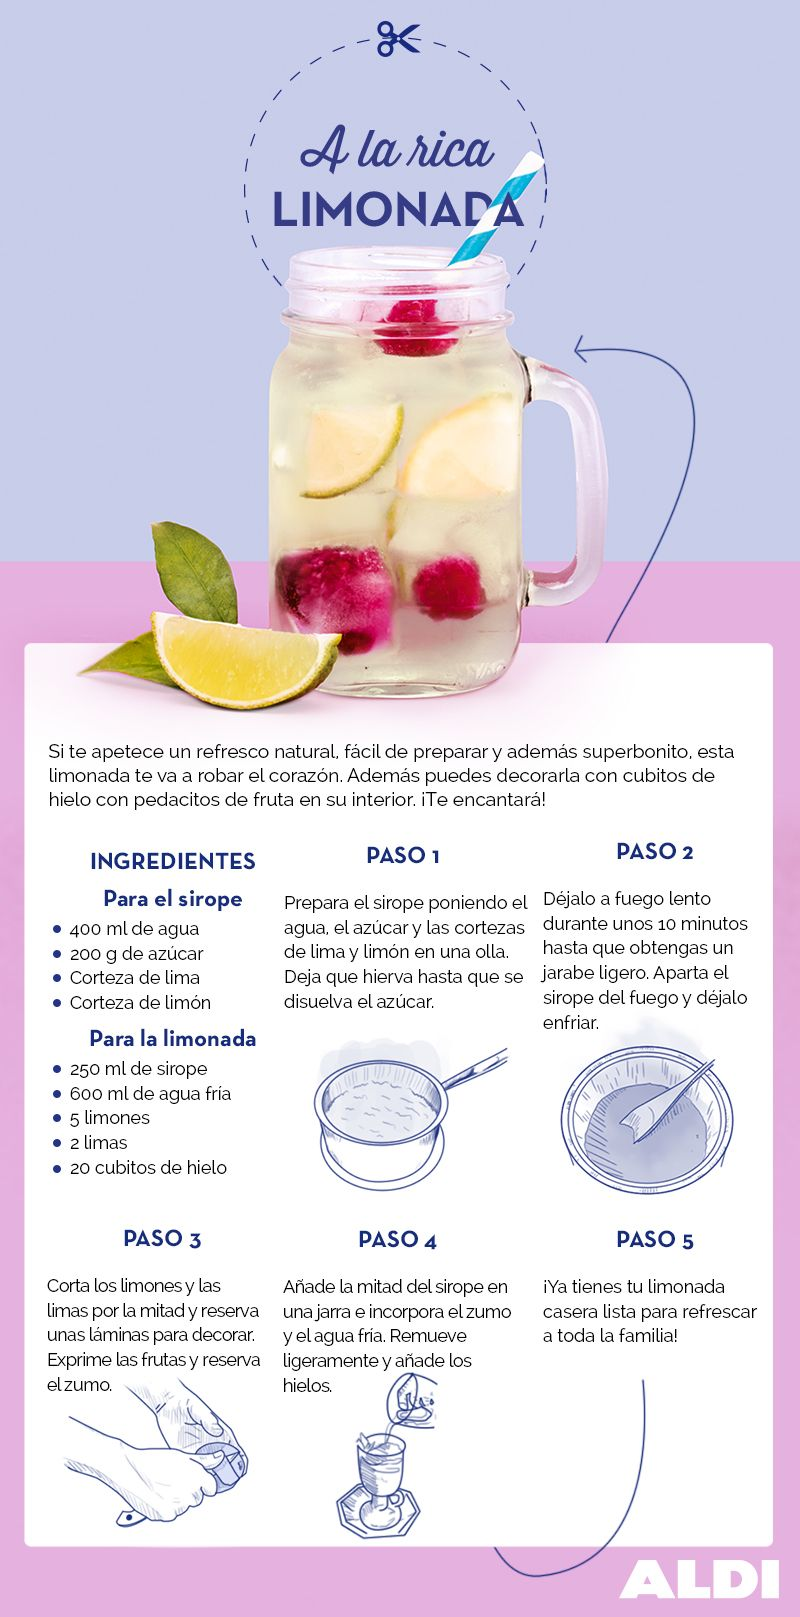 7e8196ae2630b63f57e09dea841bb537 - Limonadas Recetas